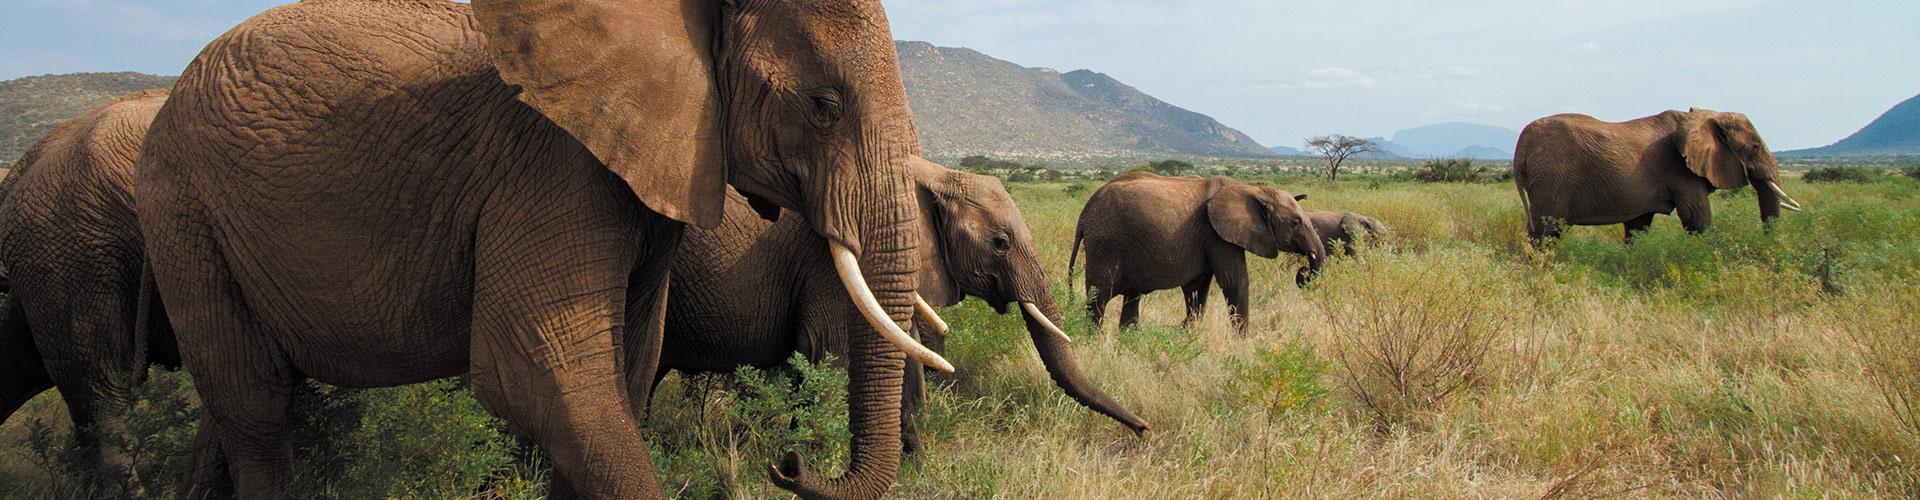 Grand Africa: Nairobi to Port Elizabeth